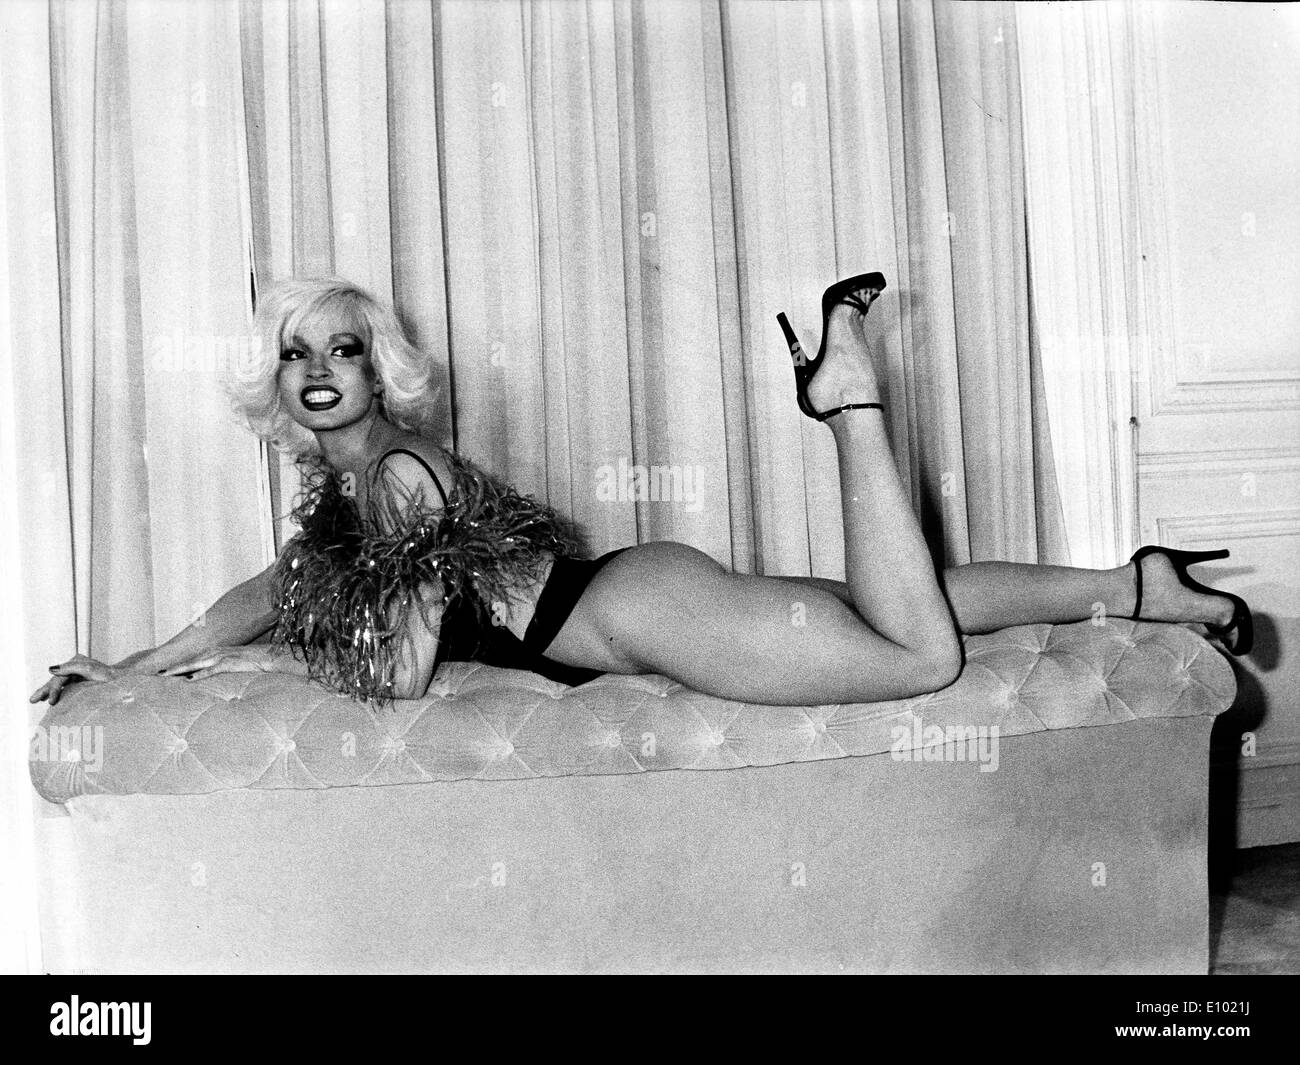 Zina Beluga, dancer at the Crazy Horse Saloon - Stock Image